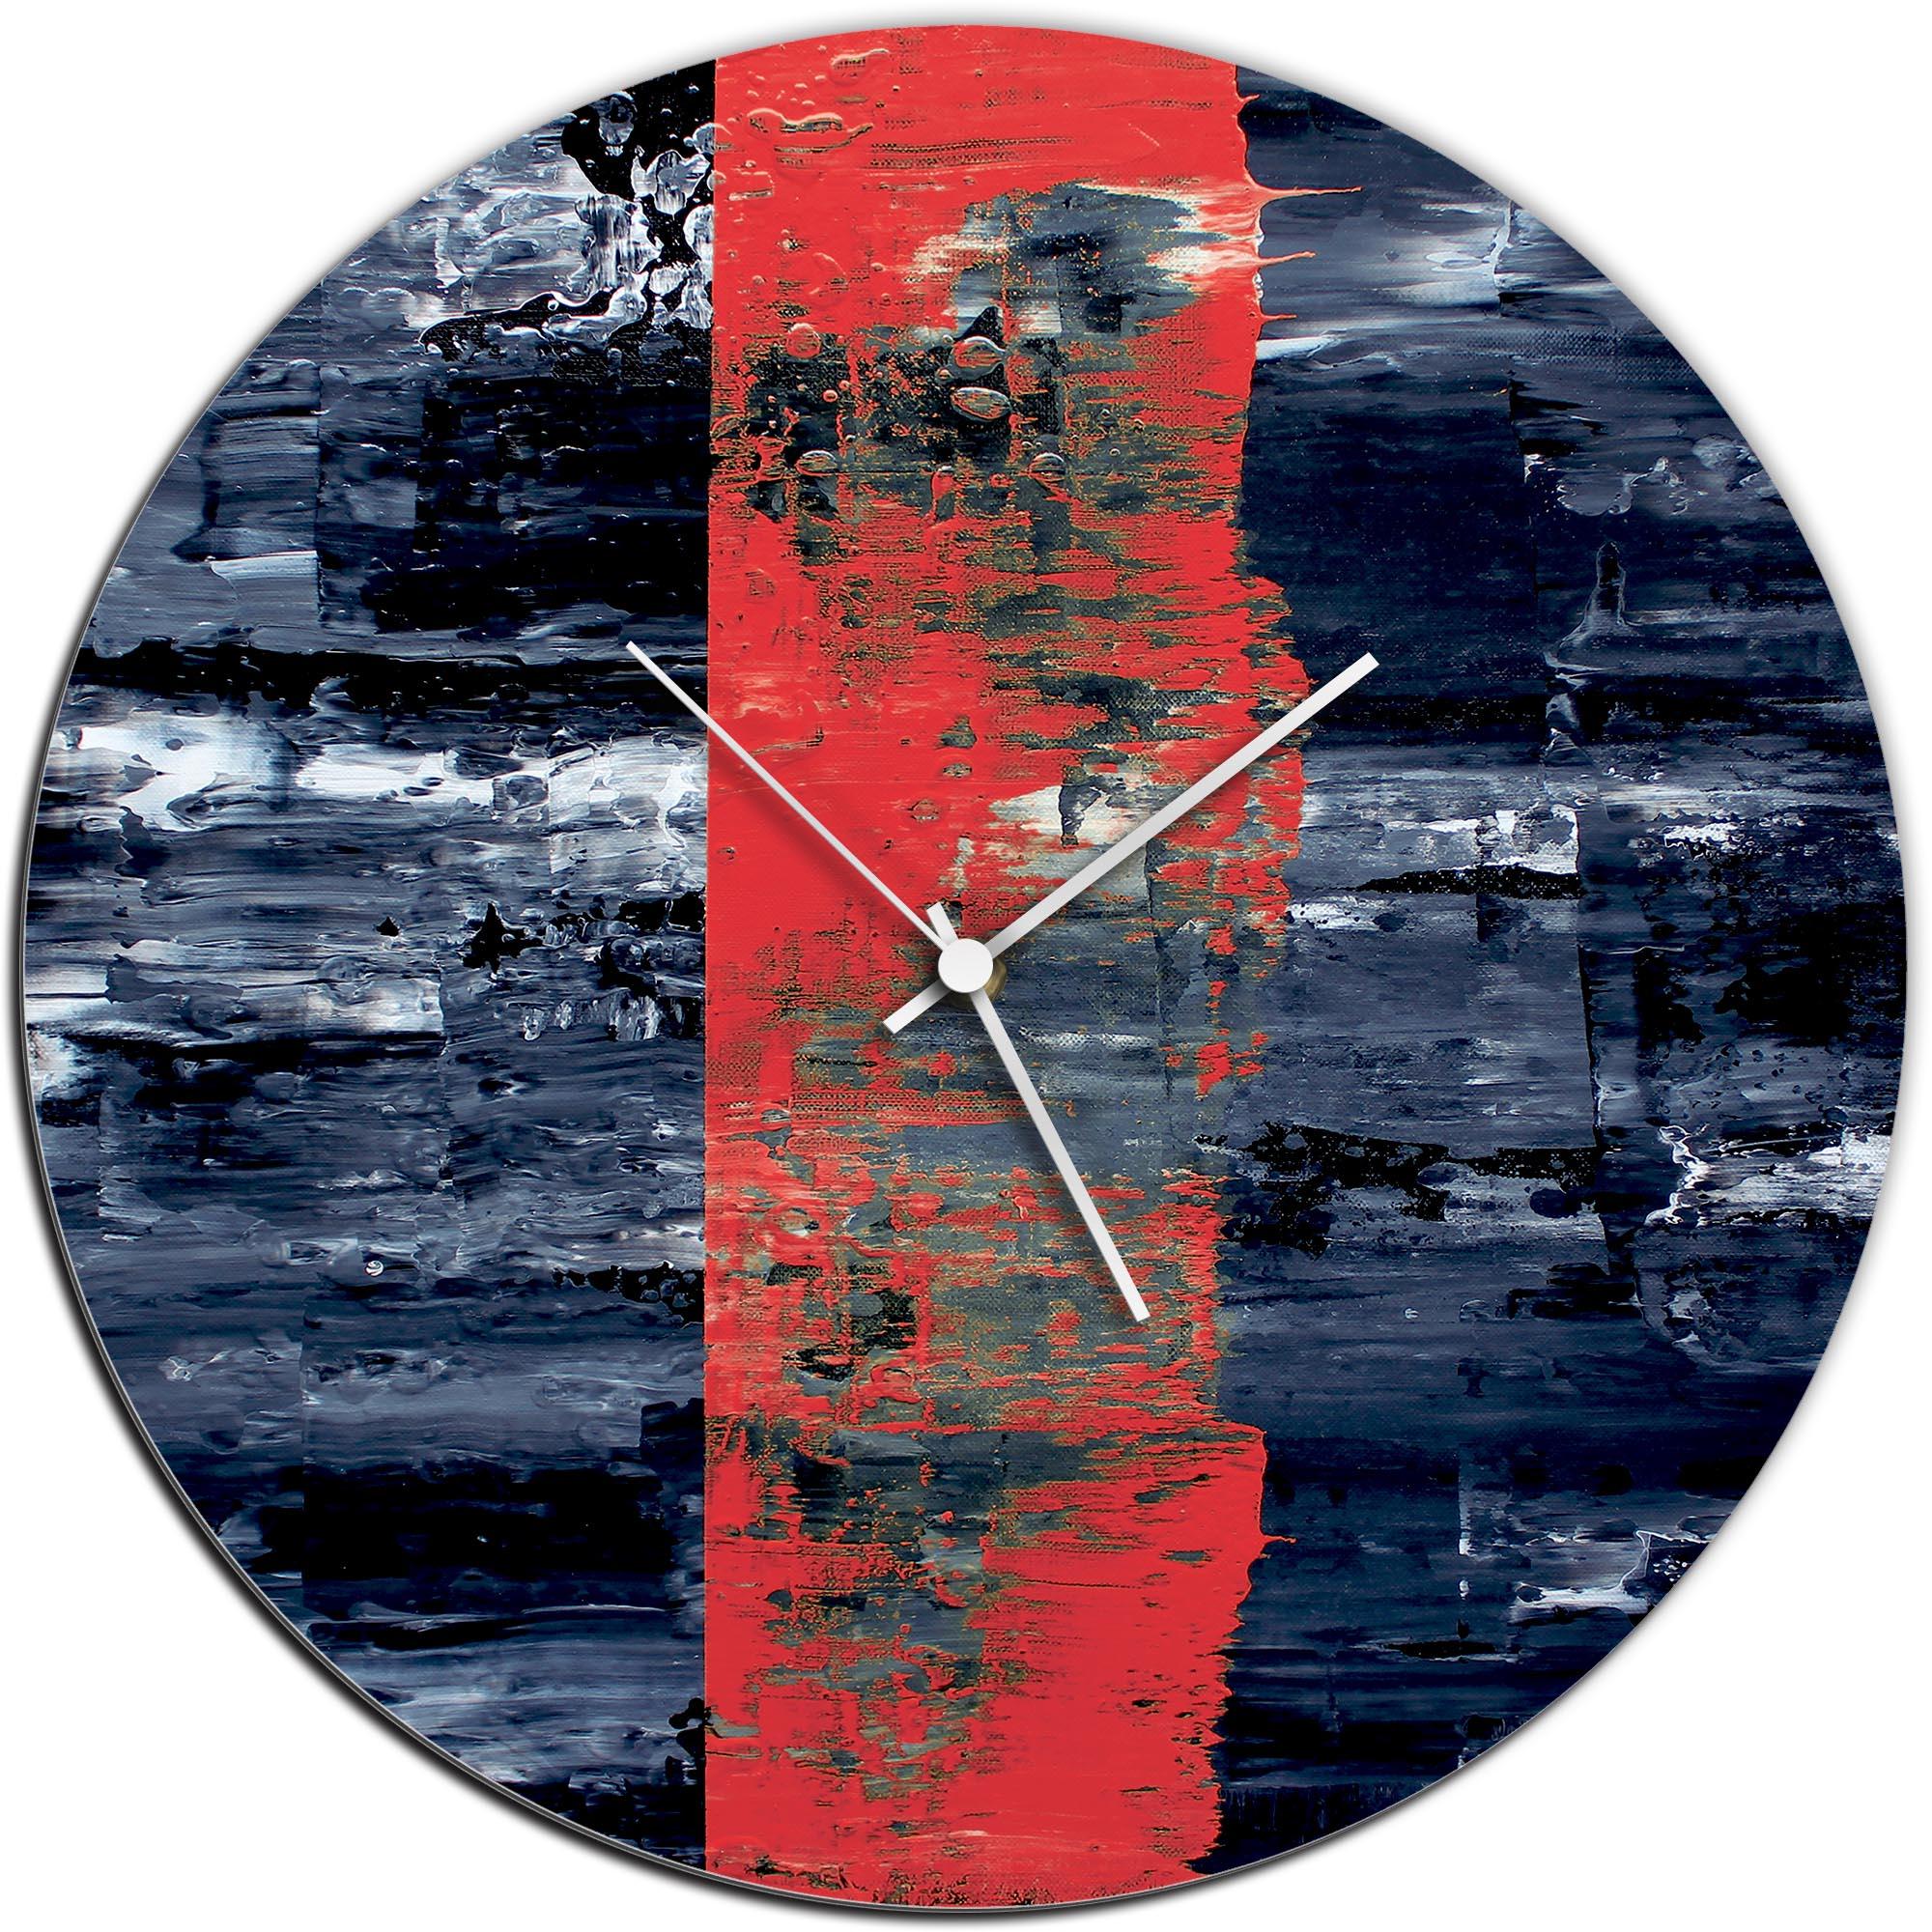 Mendo Vasilevski 'Red Line Circle Clock' 16in x 16in Modern Wall Clock on Aluminum Composite